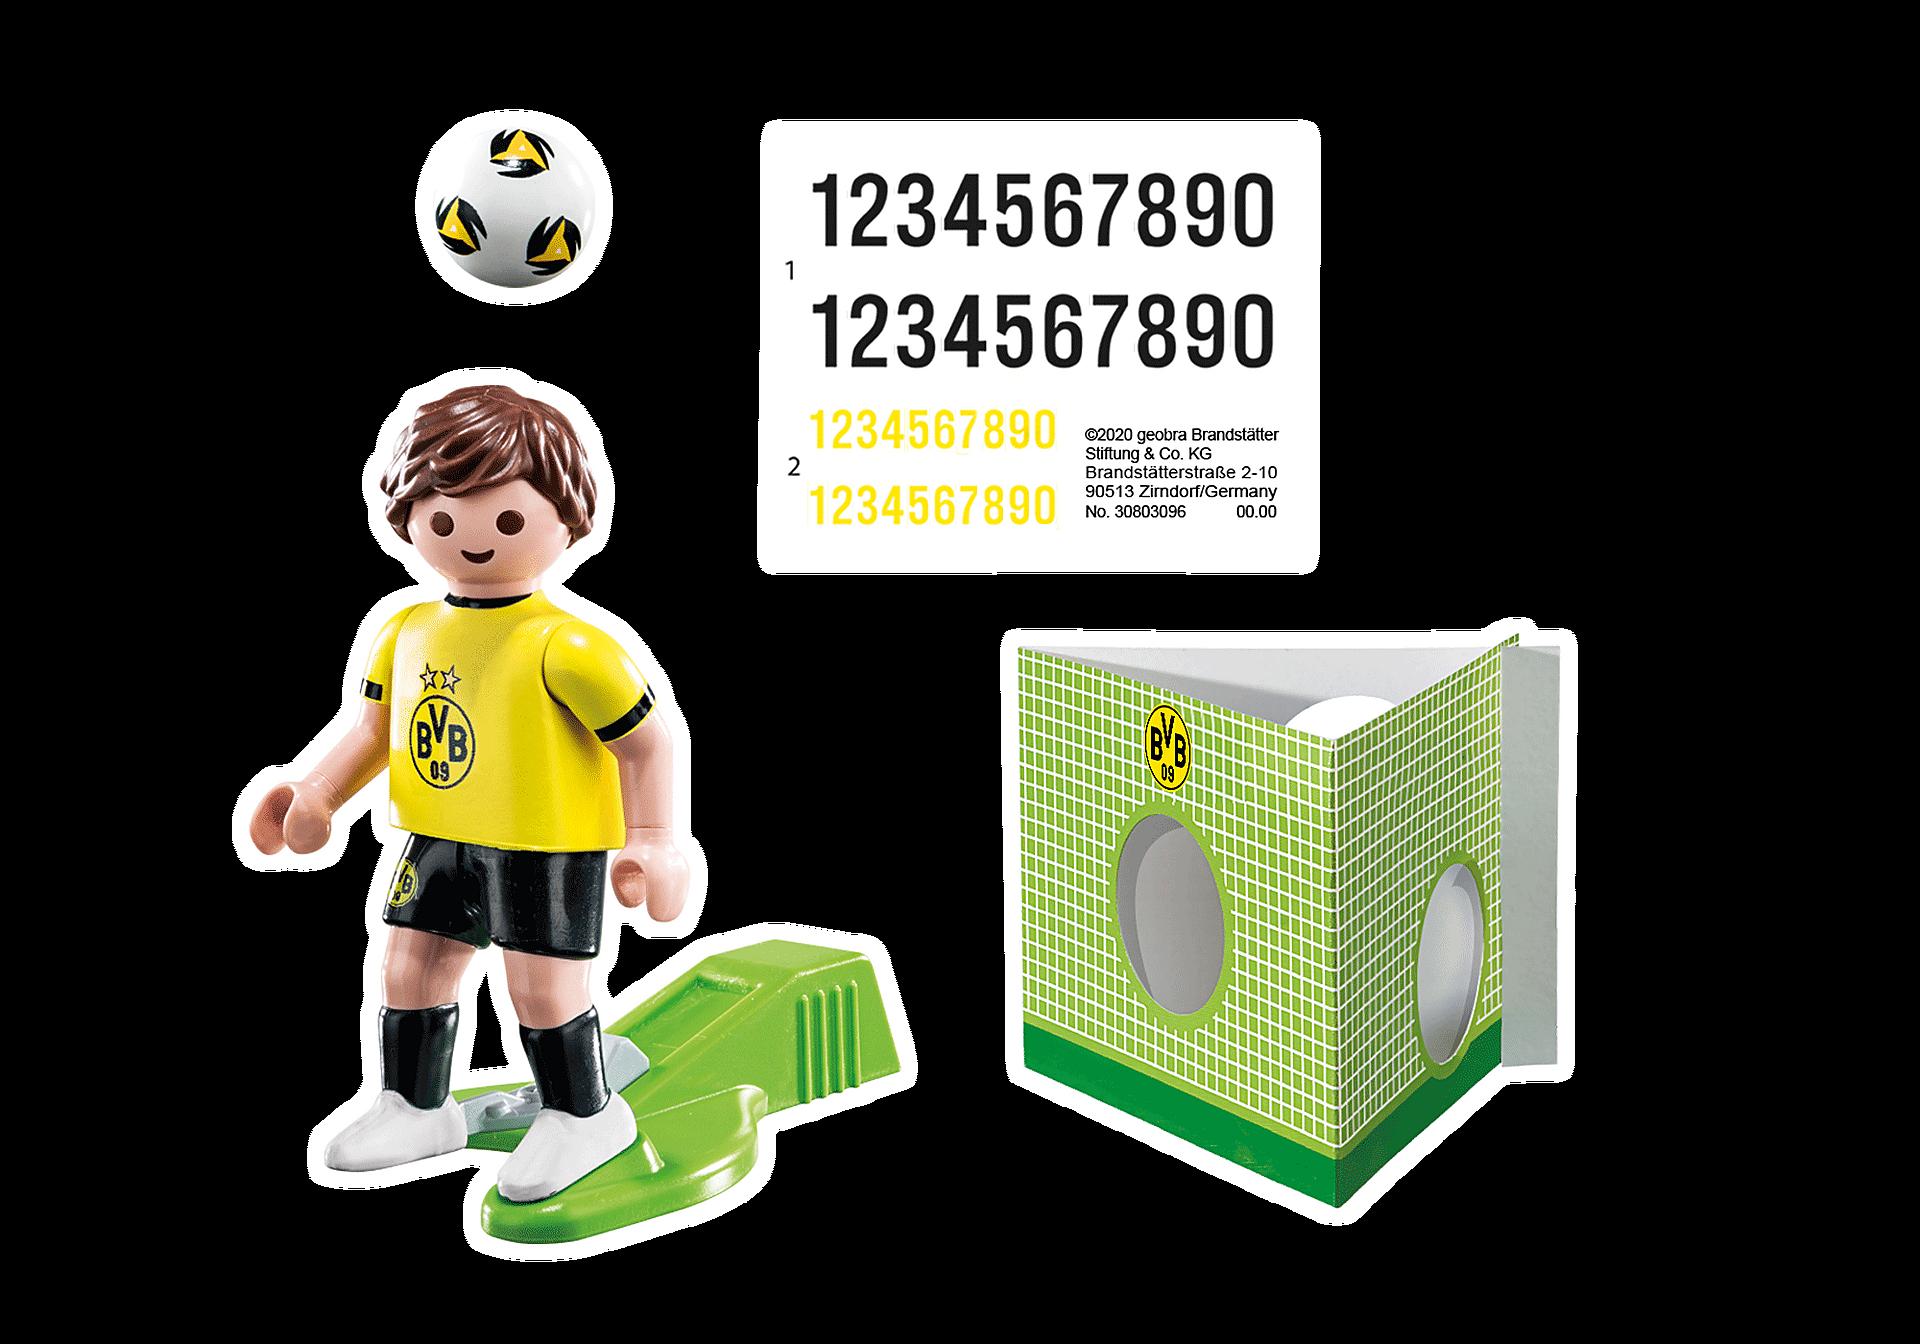 70545 Giocatore Borussia Dortmund zoom image3